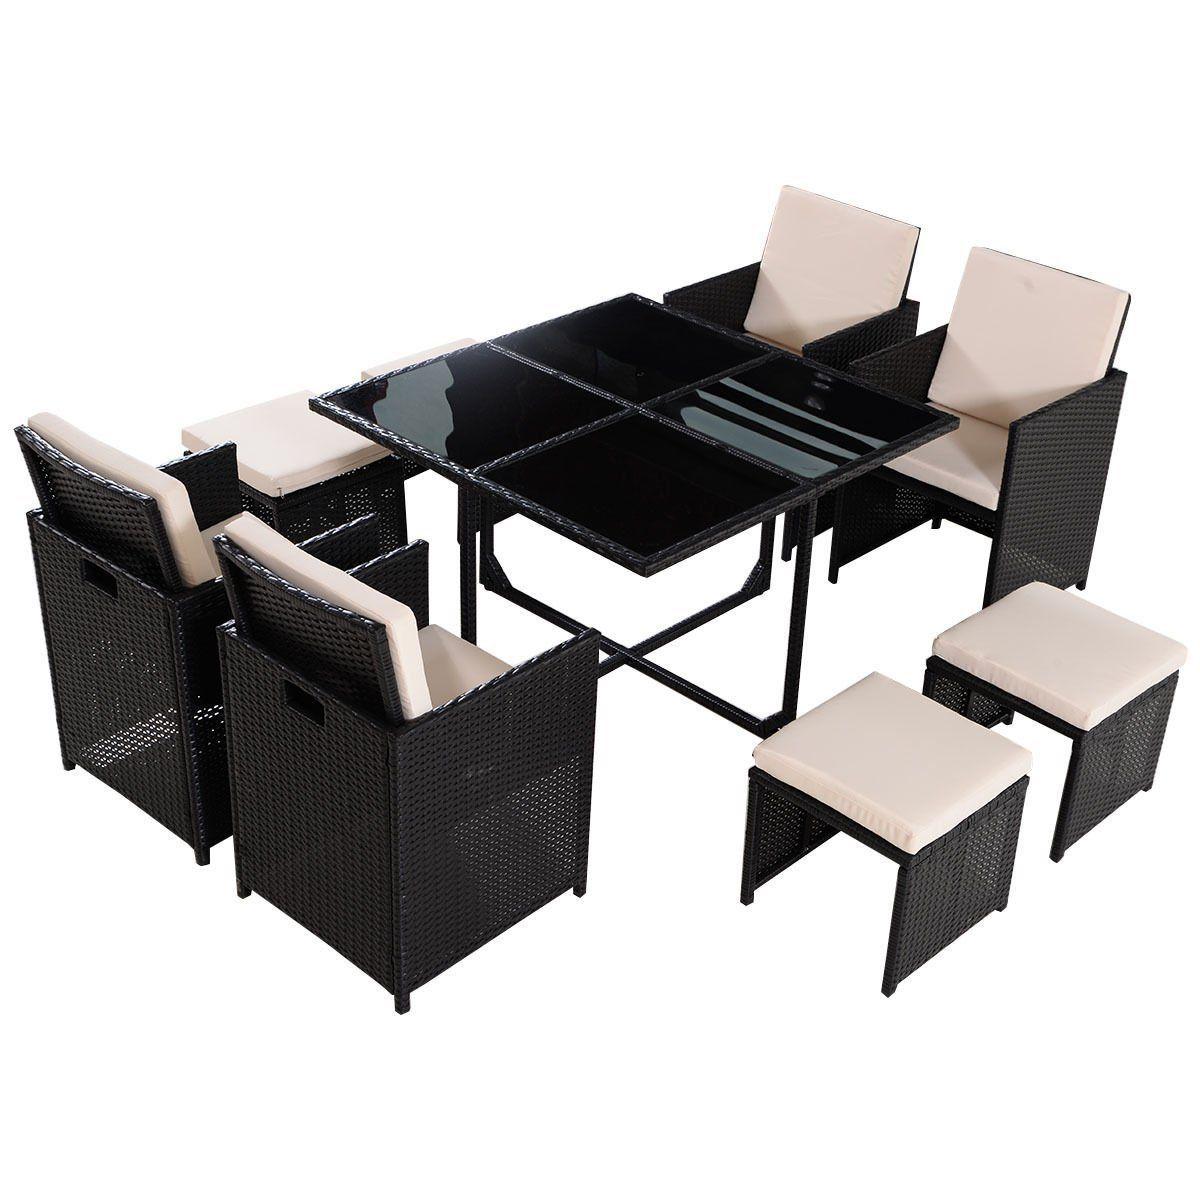 Tangkula 9 Pcs Black Patio Garden Rattan Wicker Sofa Set Furniture